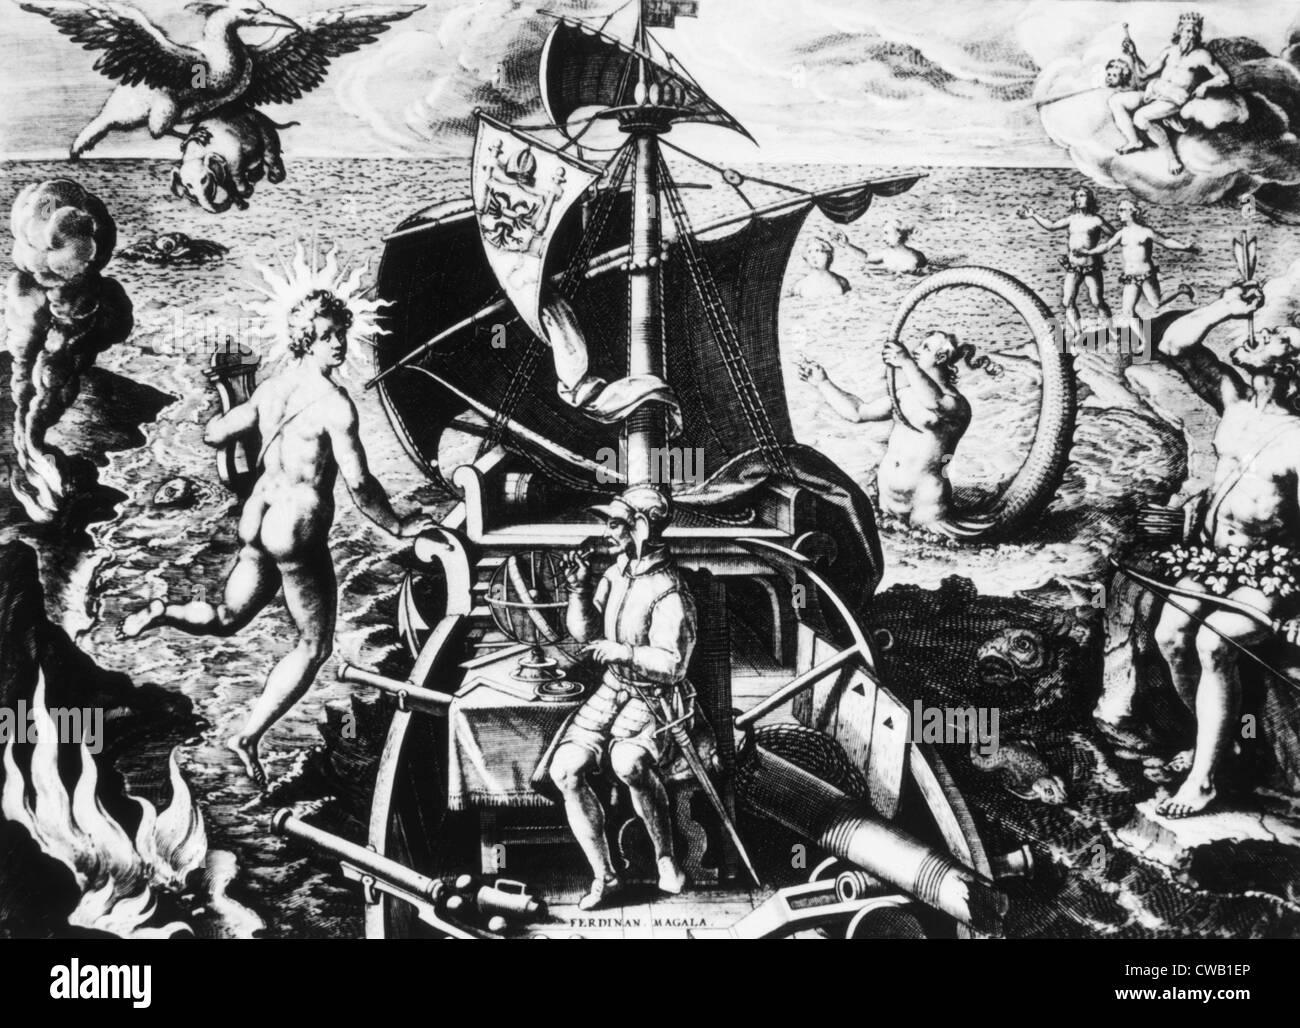 Ferdinand Magellan on his ship - Stock Image